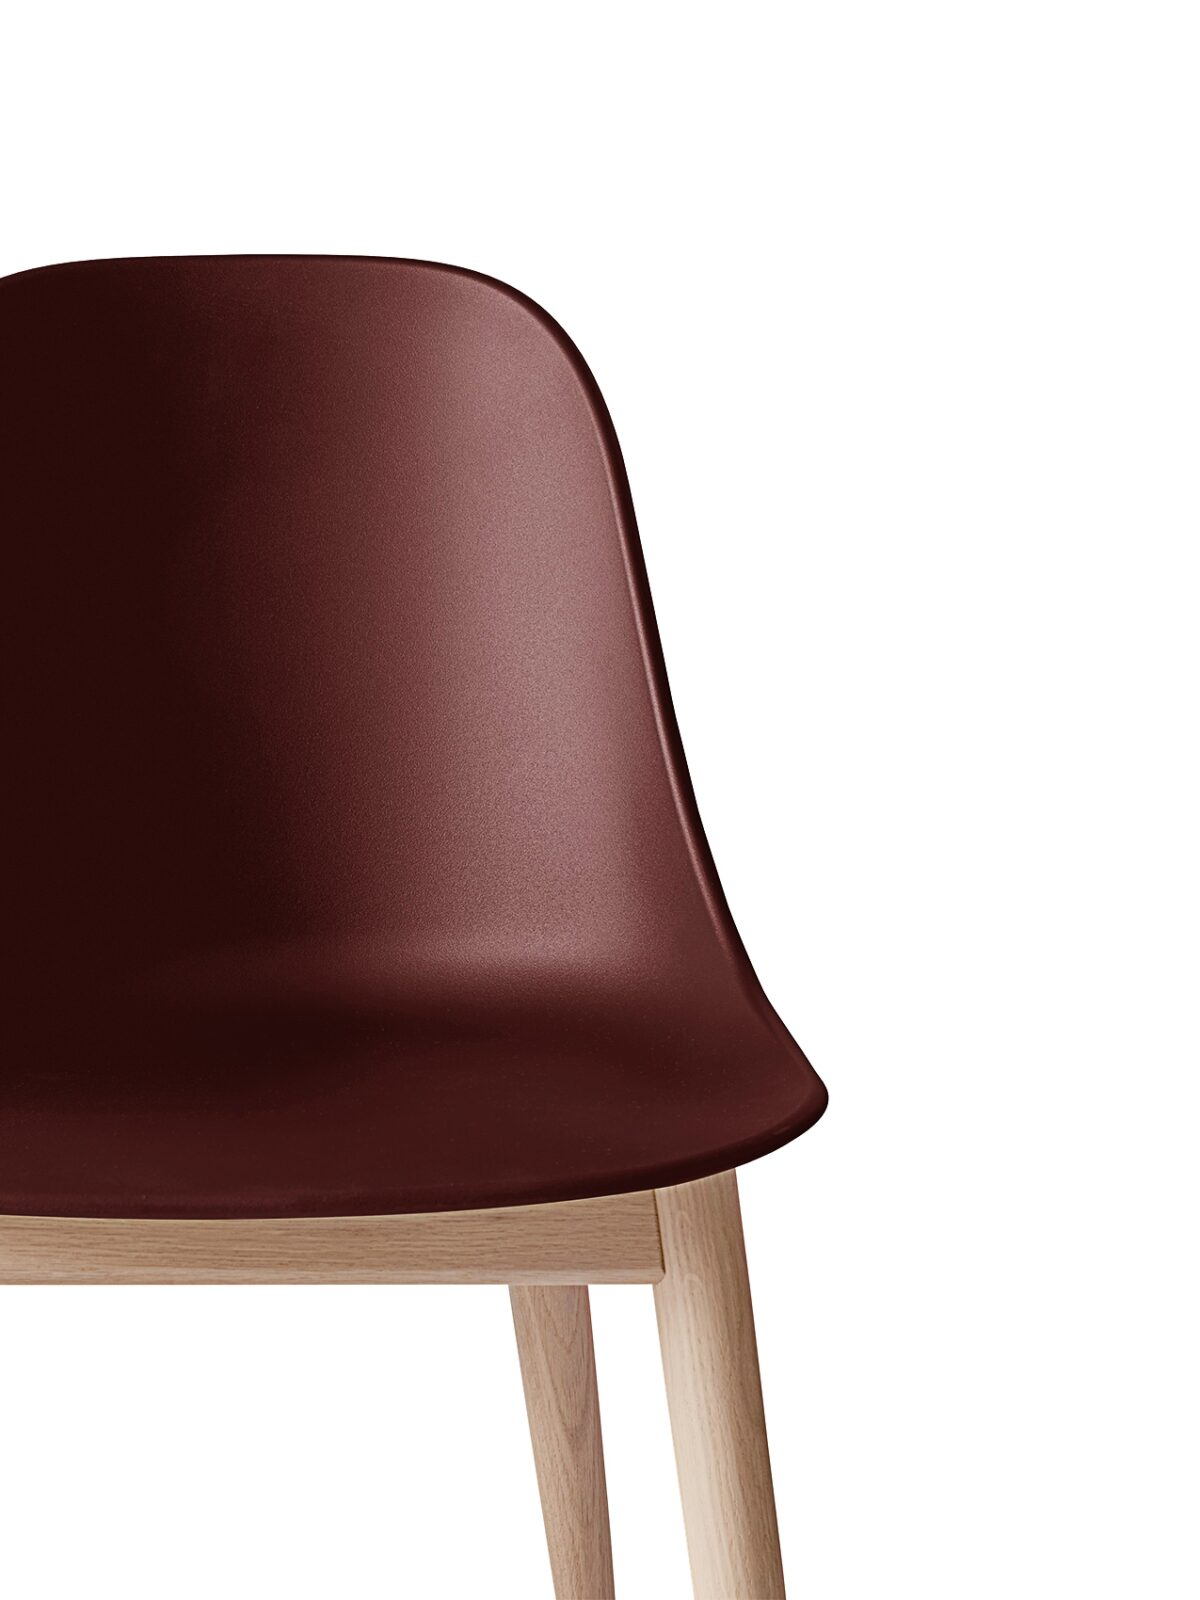 9270349 Harbour Side Chair BurnedRed NaturalOak CloseUp